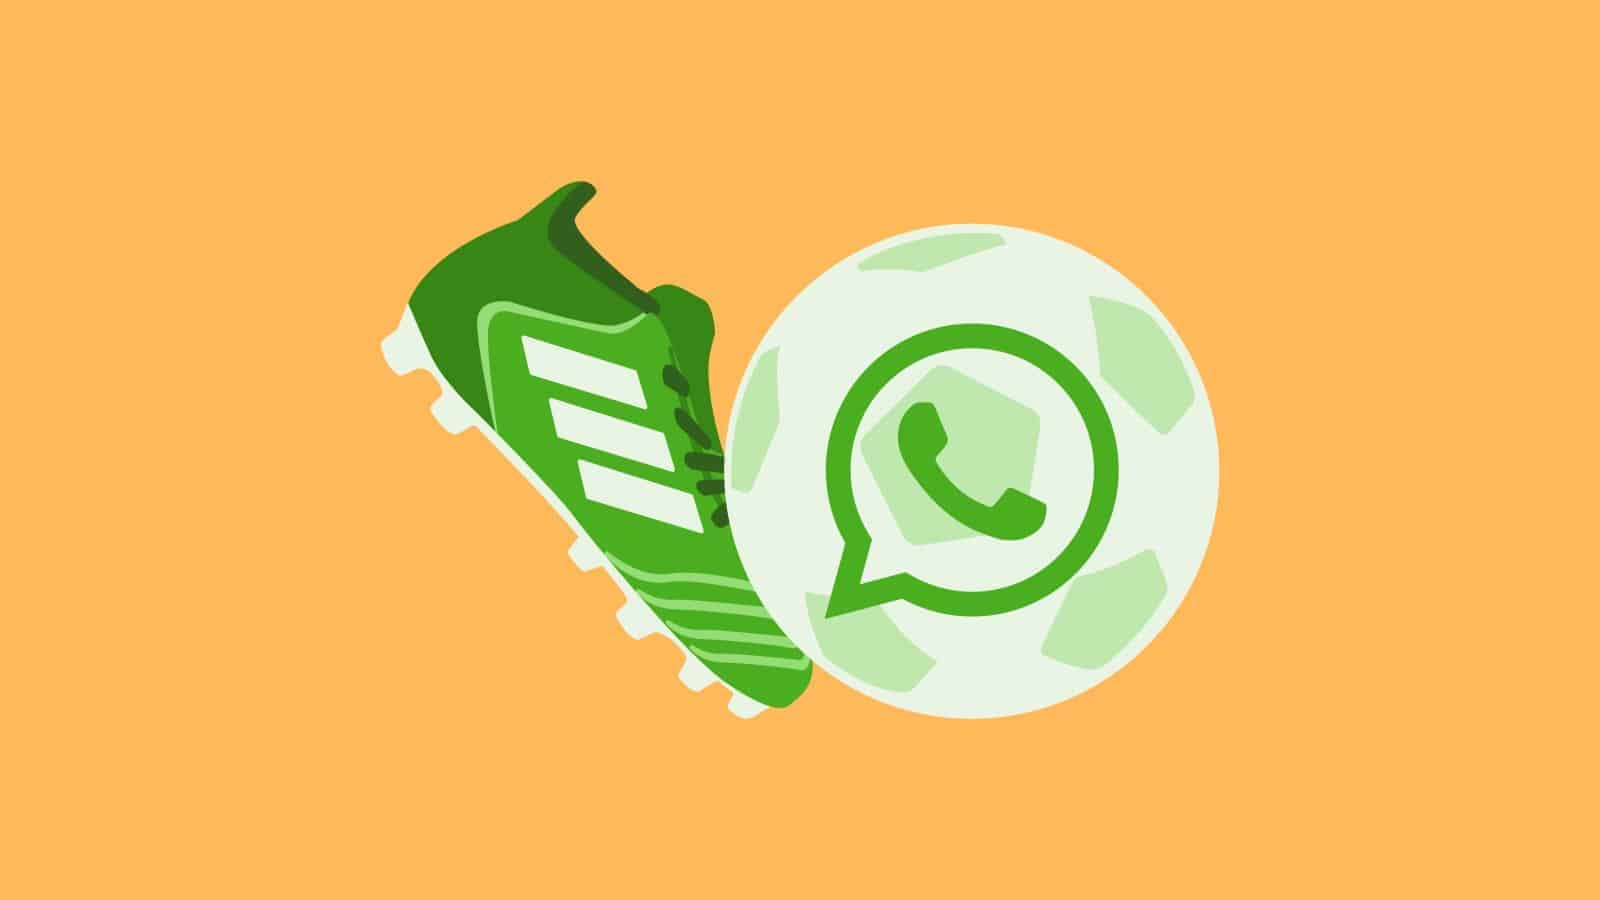 WhatsApp marketing: todo lo que debes saber [guía 2020]